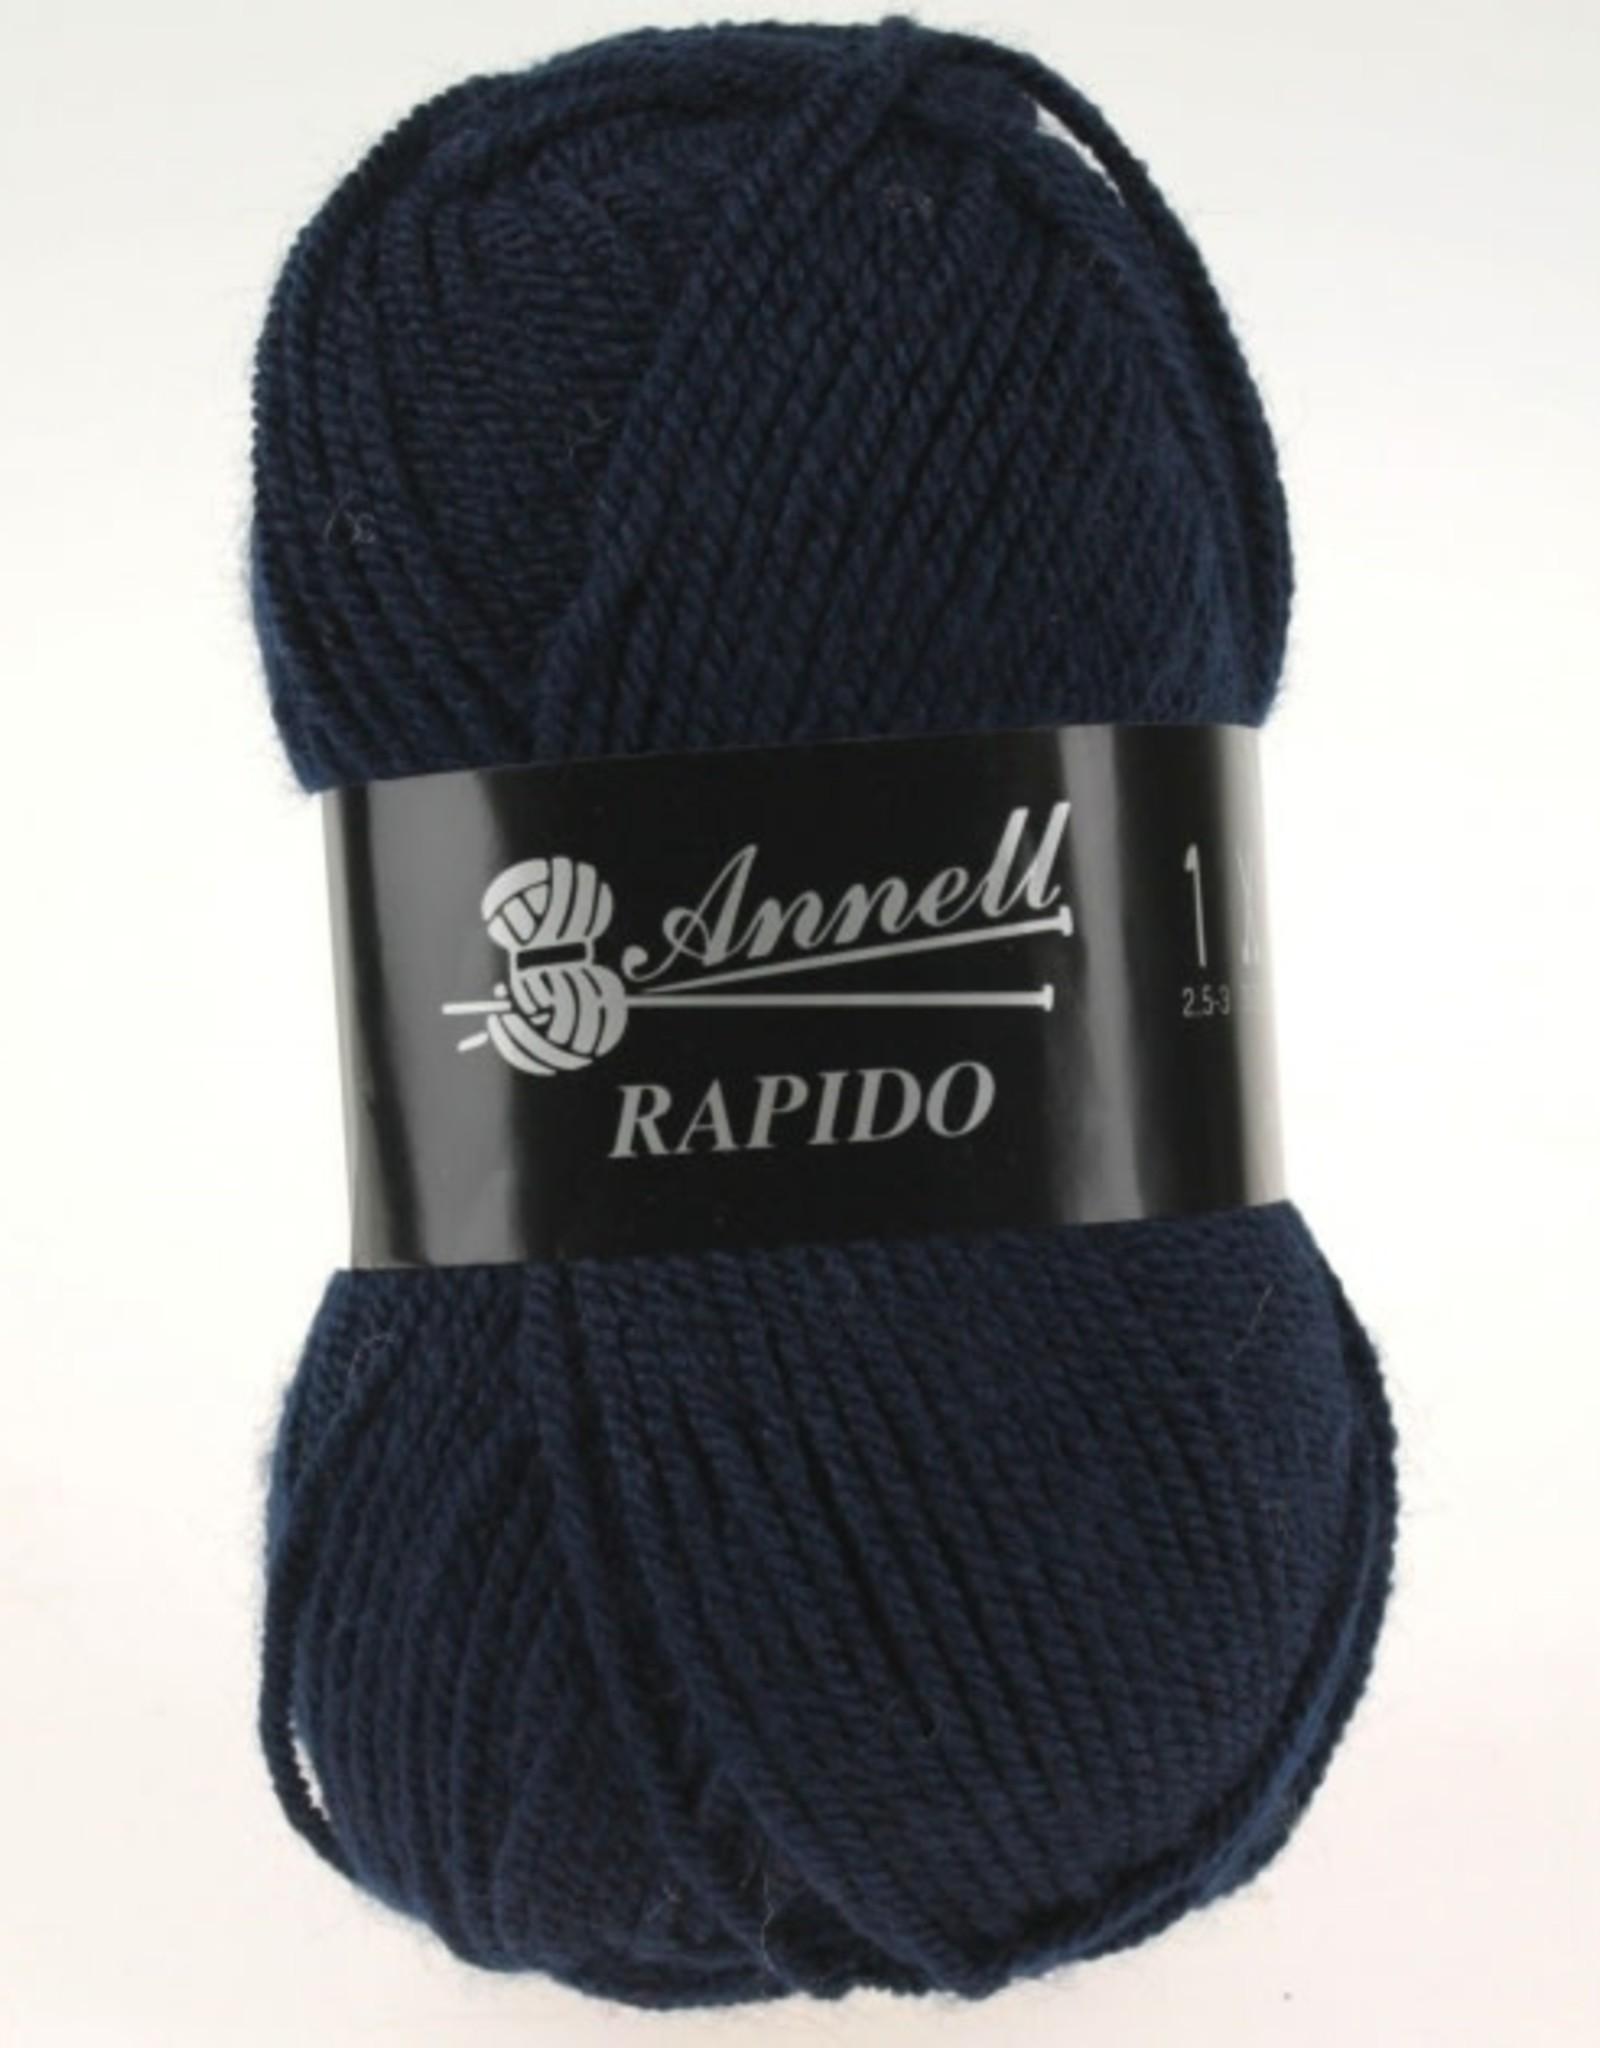 Annell Annell rapido 3226